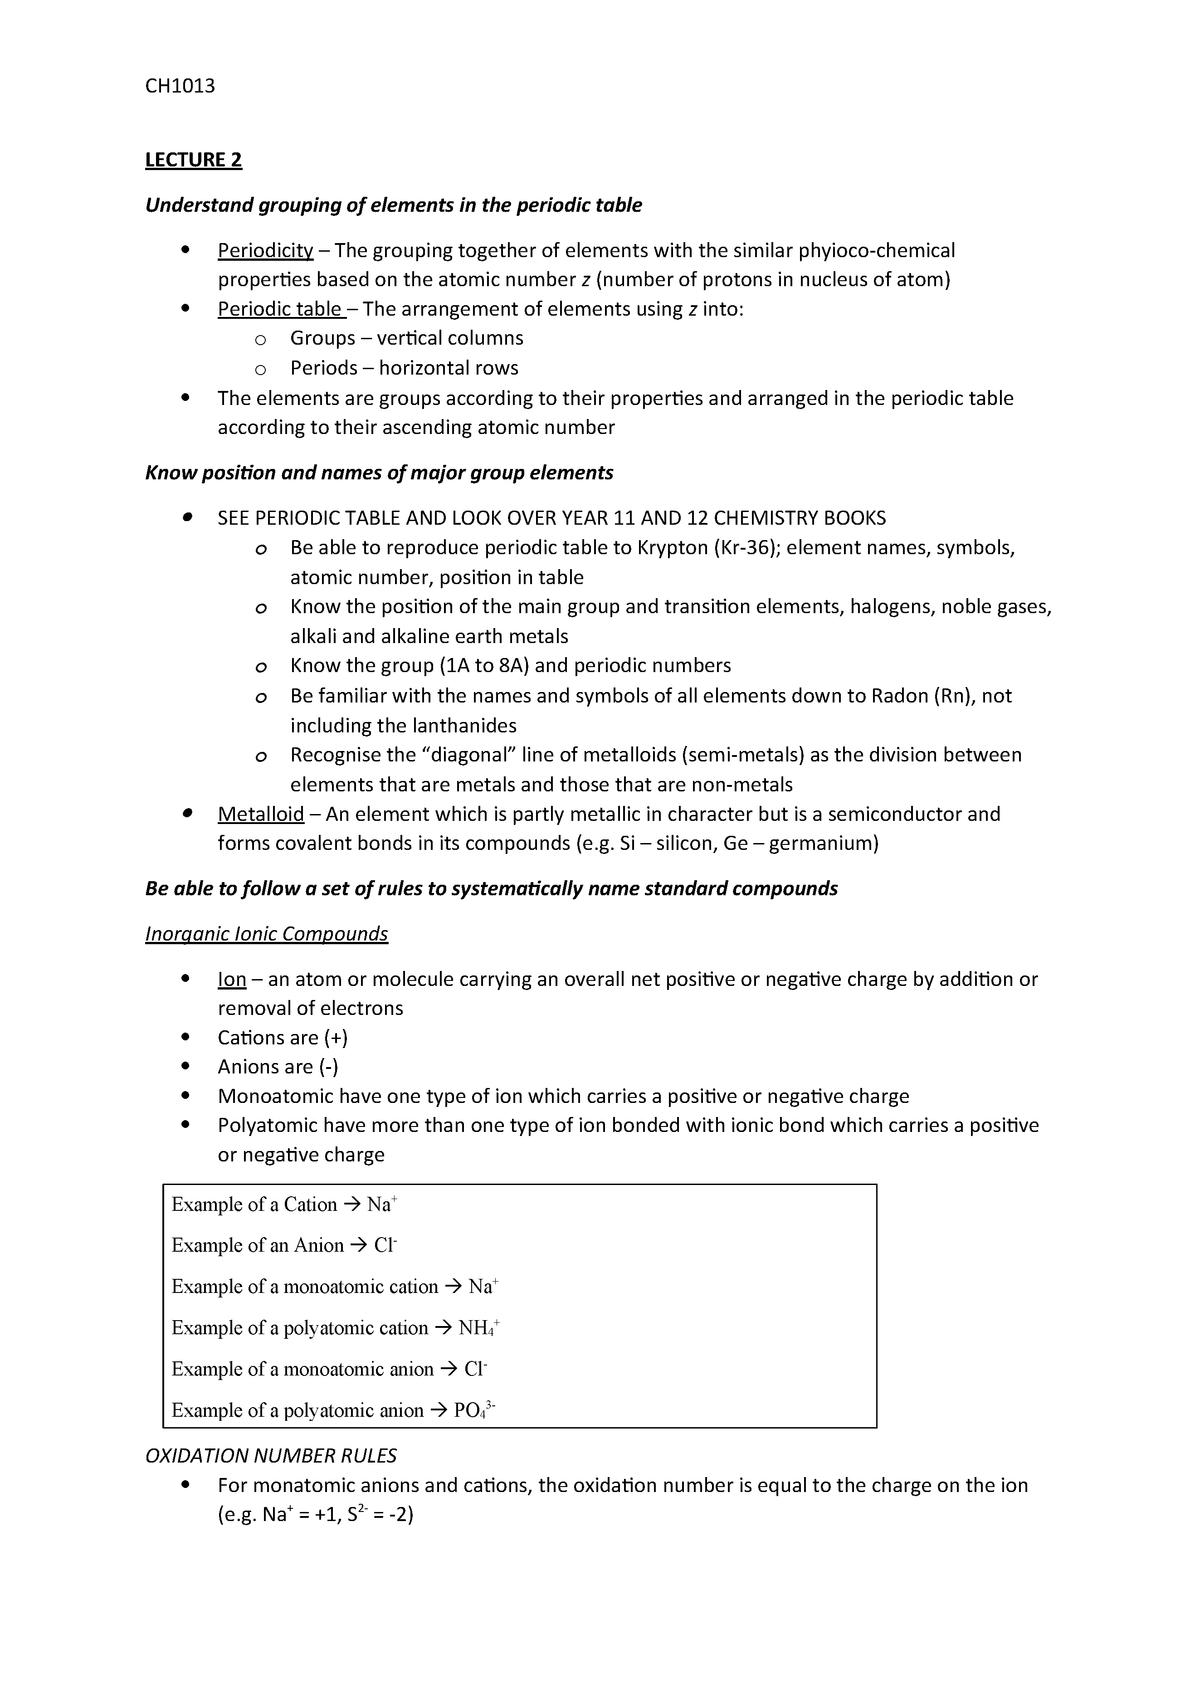 Lecture 2 - Periodic Table - CH1001:03 - JCU - StuDocu